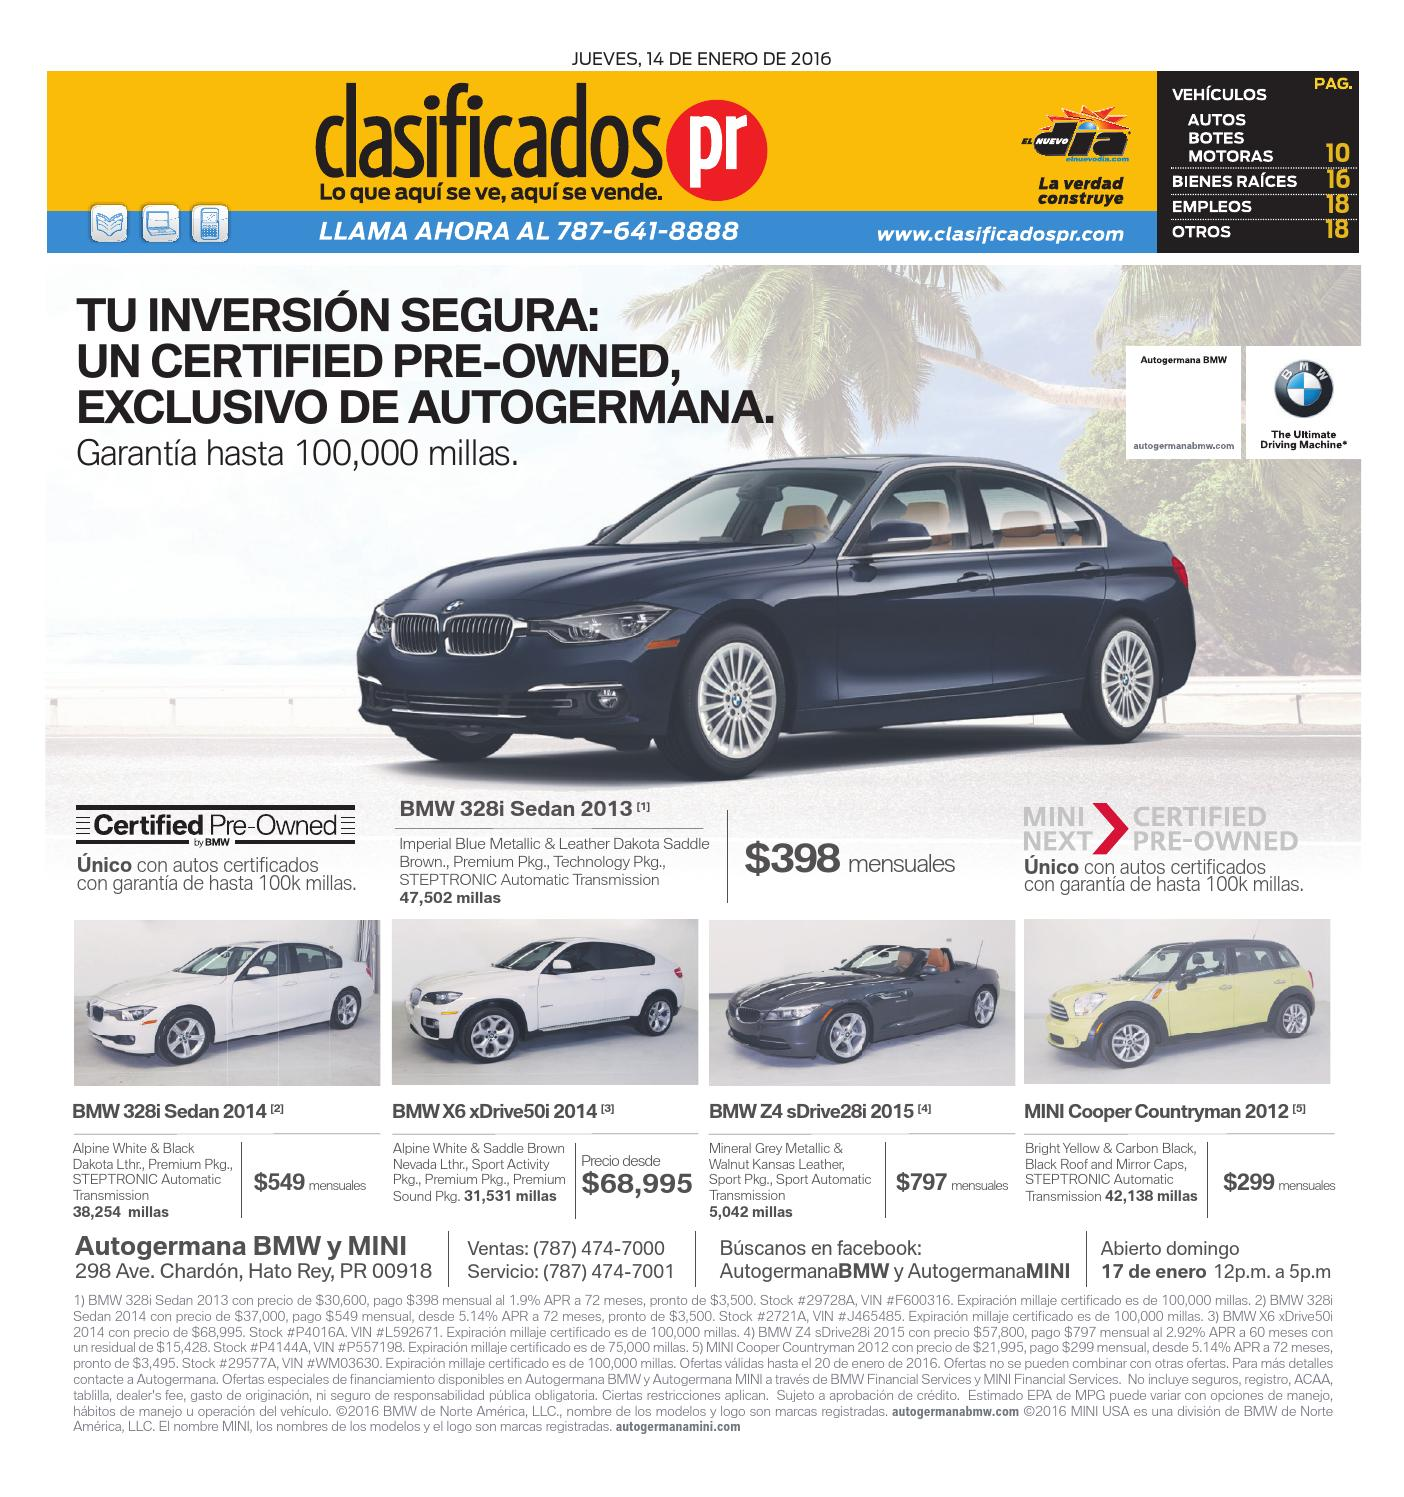 ClasificadosPR 01 14 2016 By ClasificadosPR.com